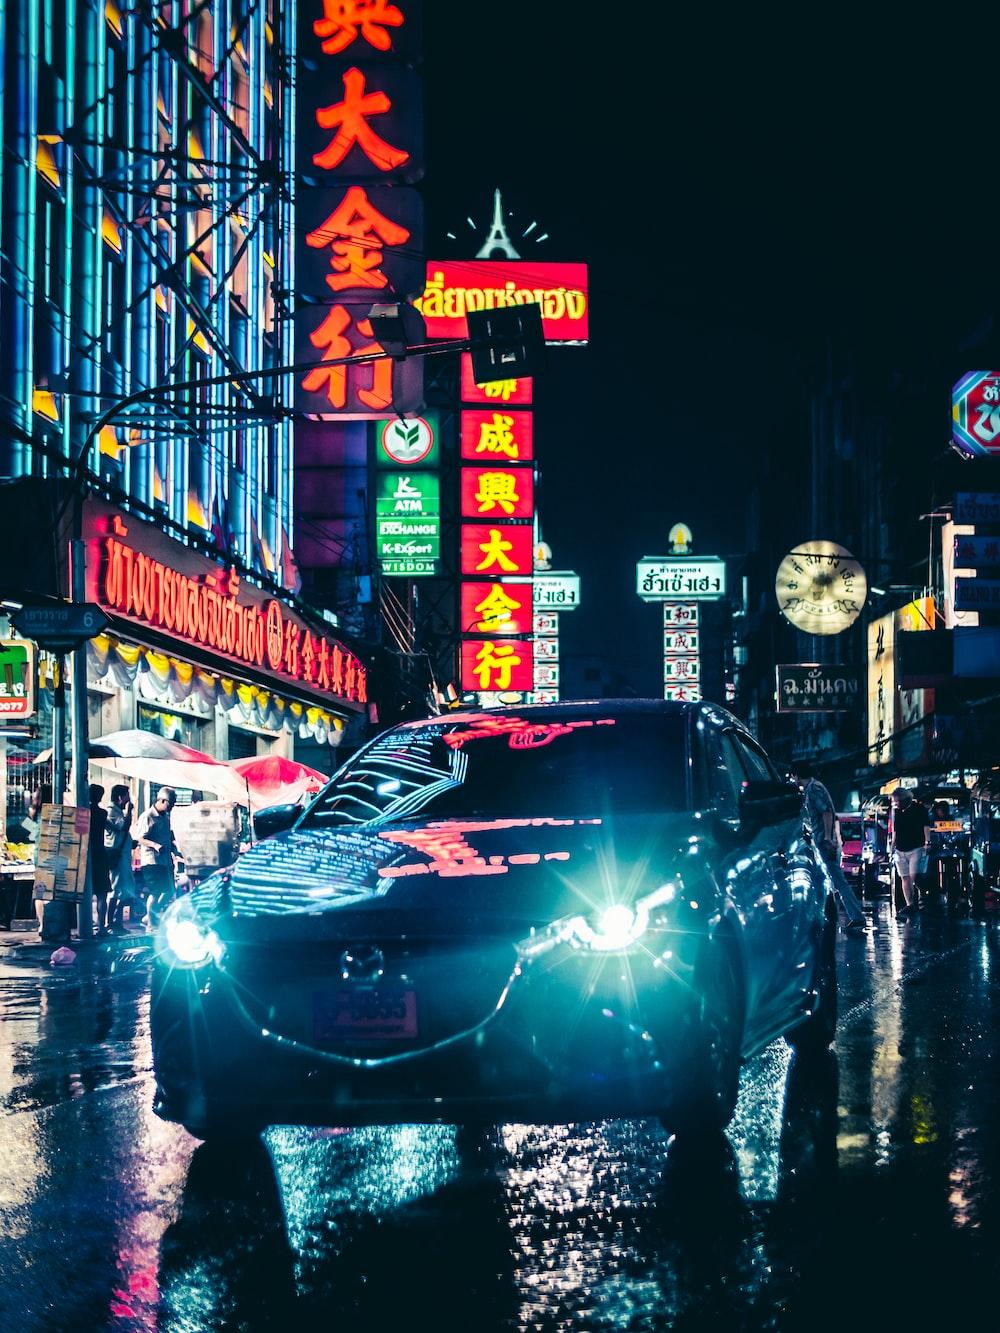 gray Mazda sedan on road viewing buildings during night time